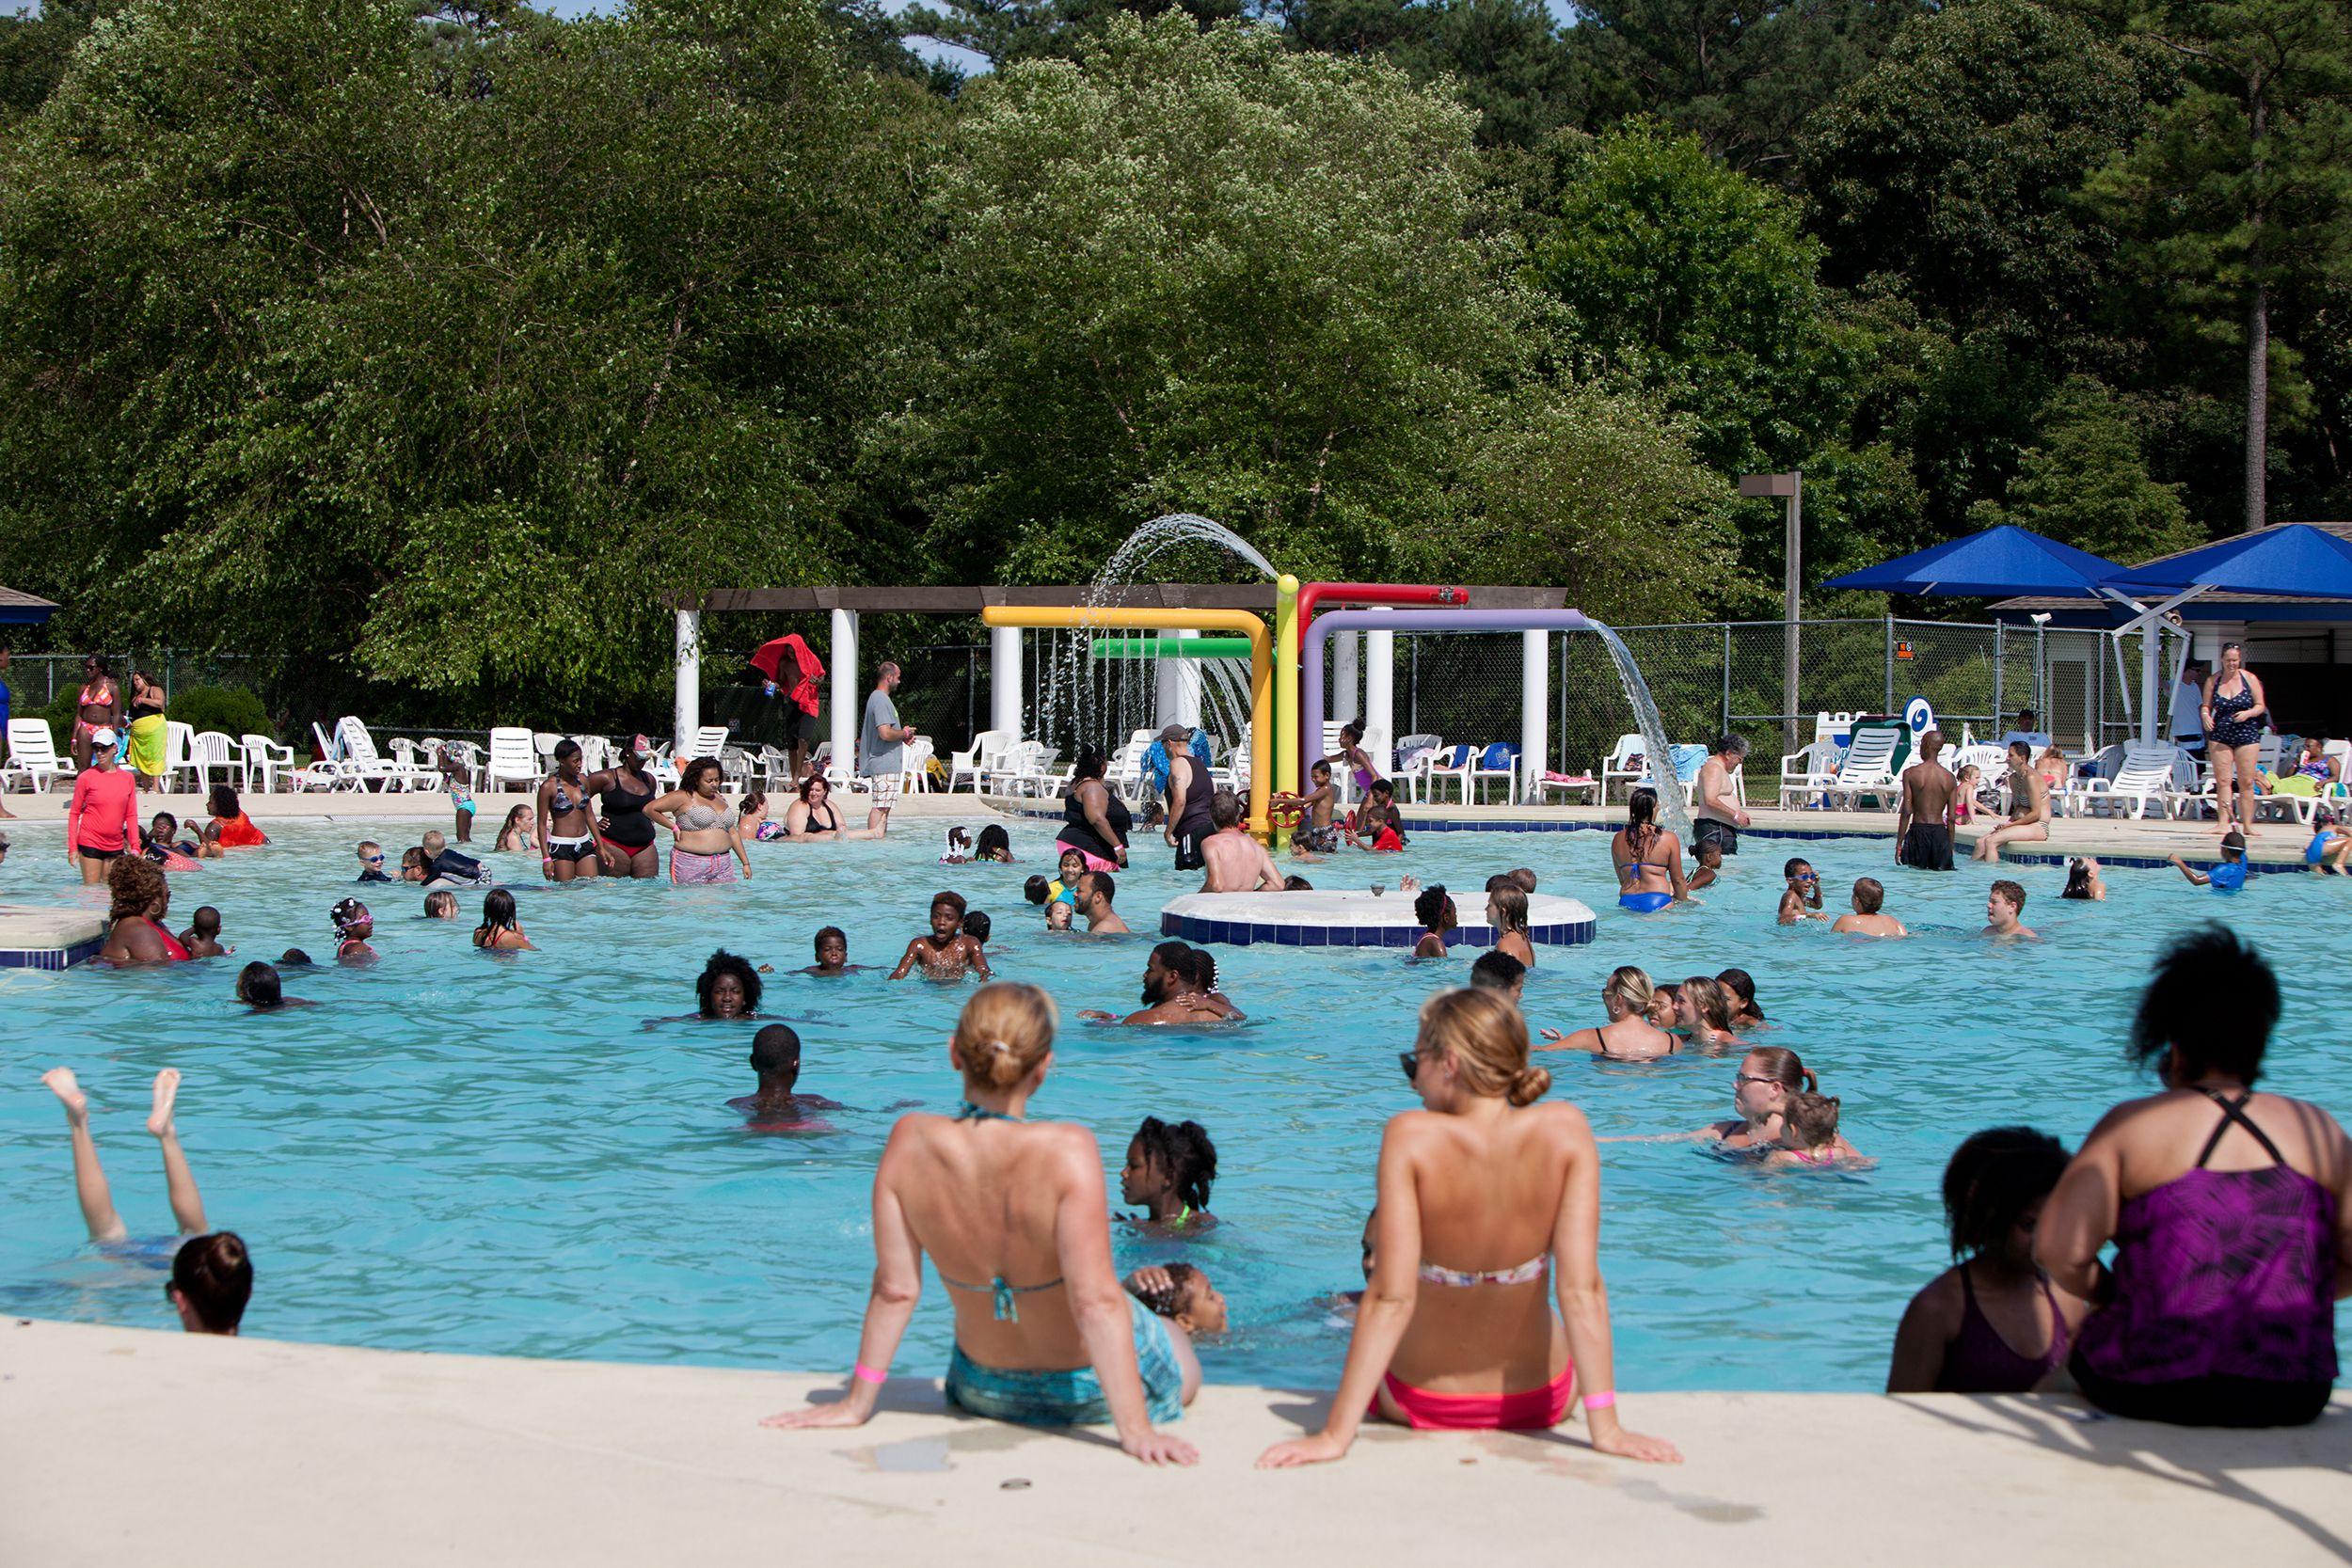 Killens Pond State Water Park